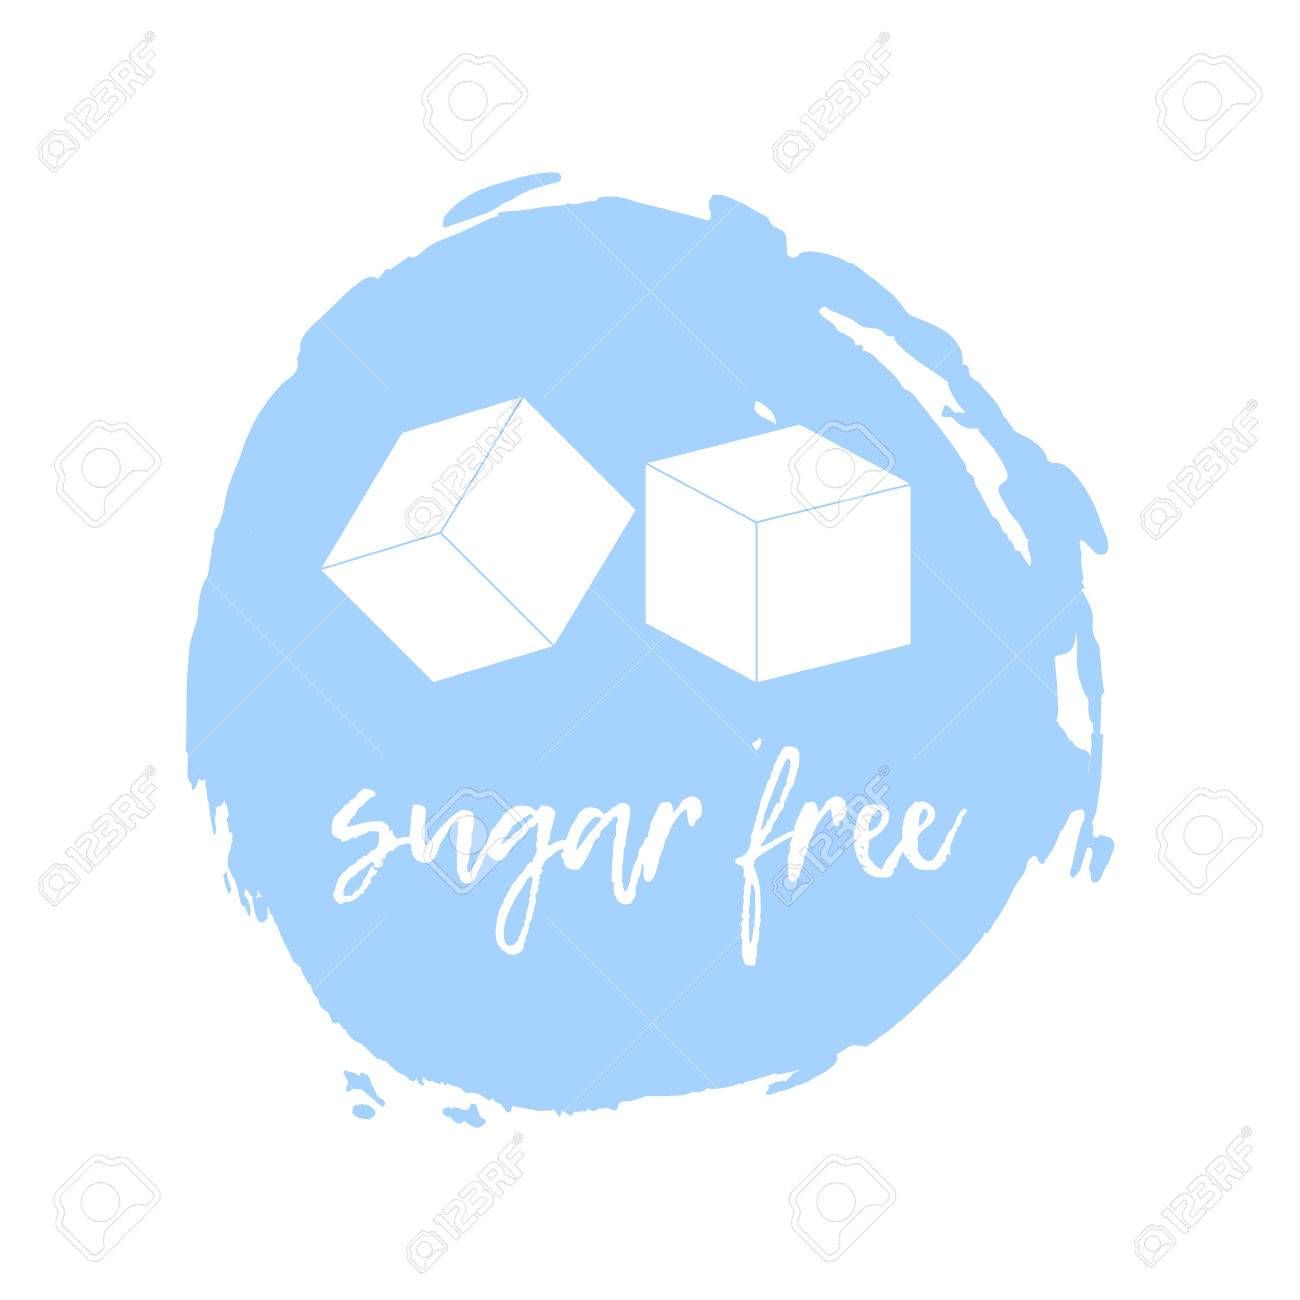 Sugar free label food intolerance symbols vector illustration sugar free label food intolerance symbols vector illustration stock vector 77785677 biocorpaavc Images